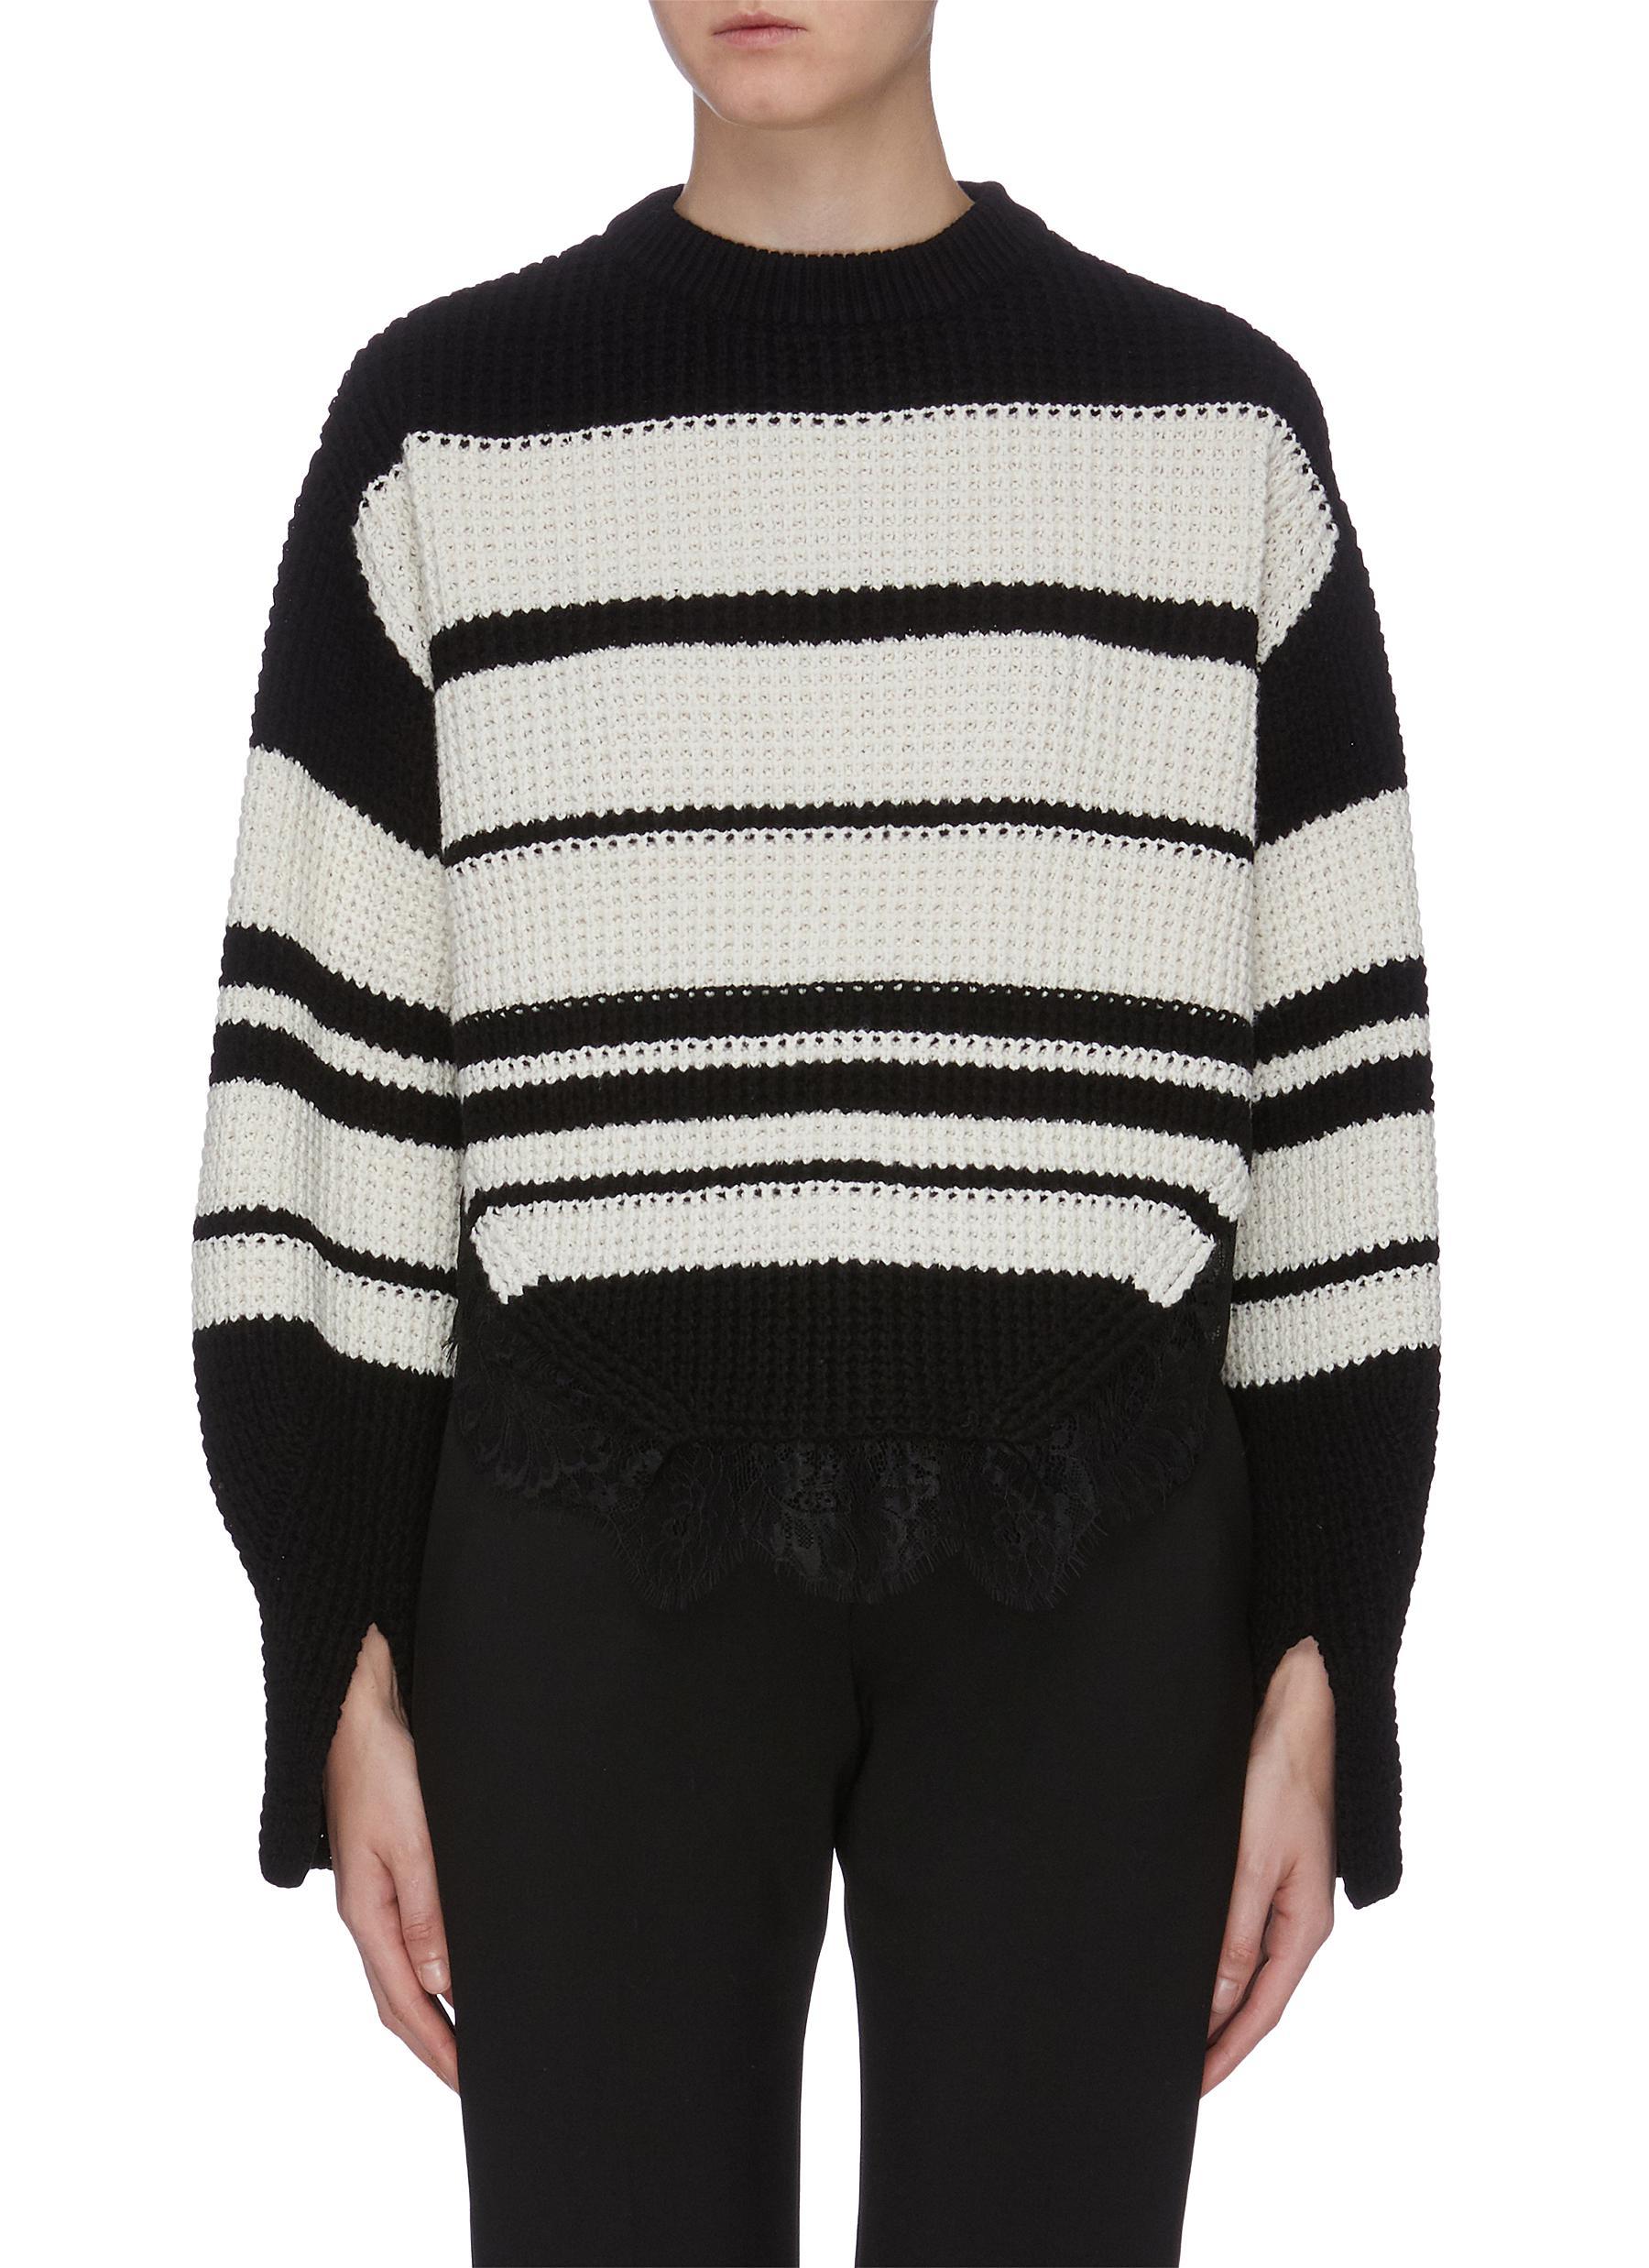 Lace hem stripe waffle knit oversized sweater by Self-Portrait